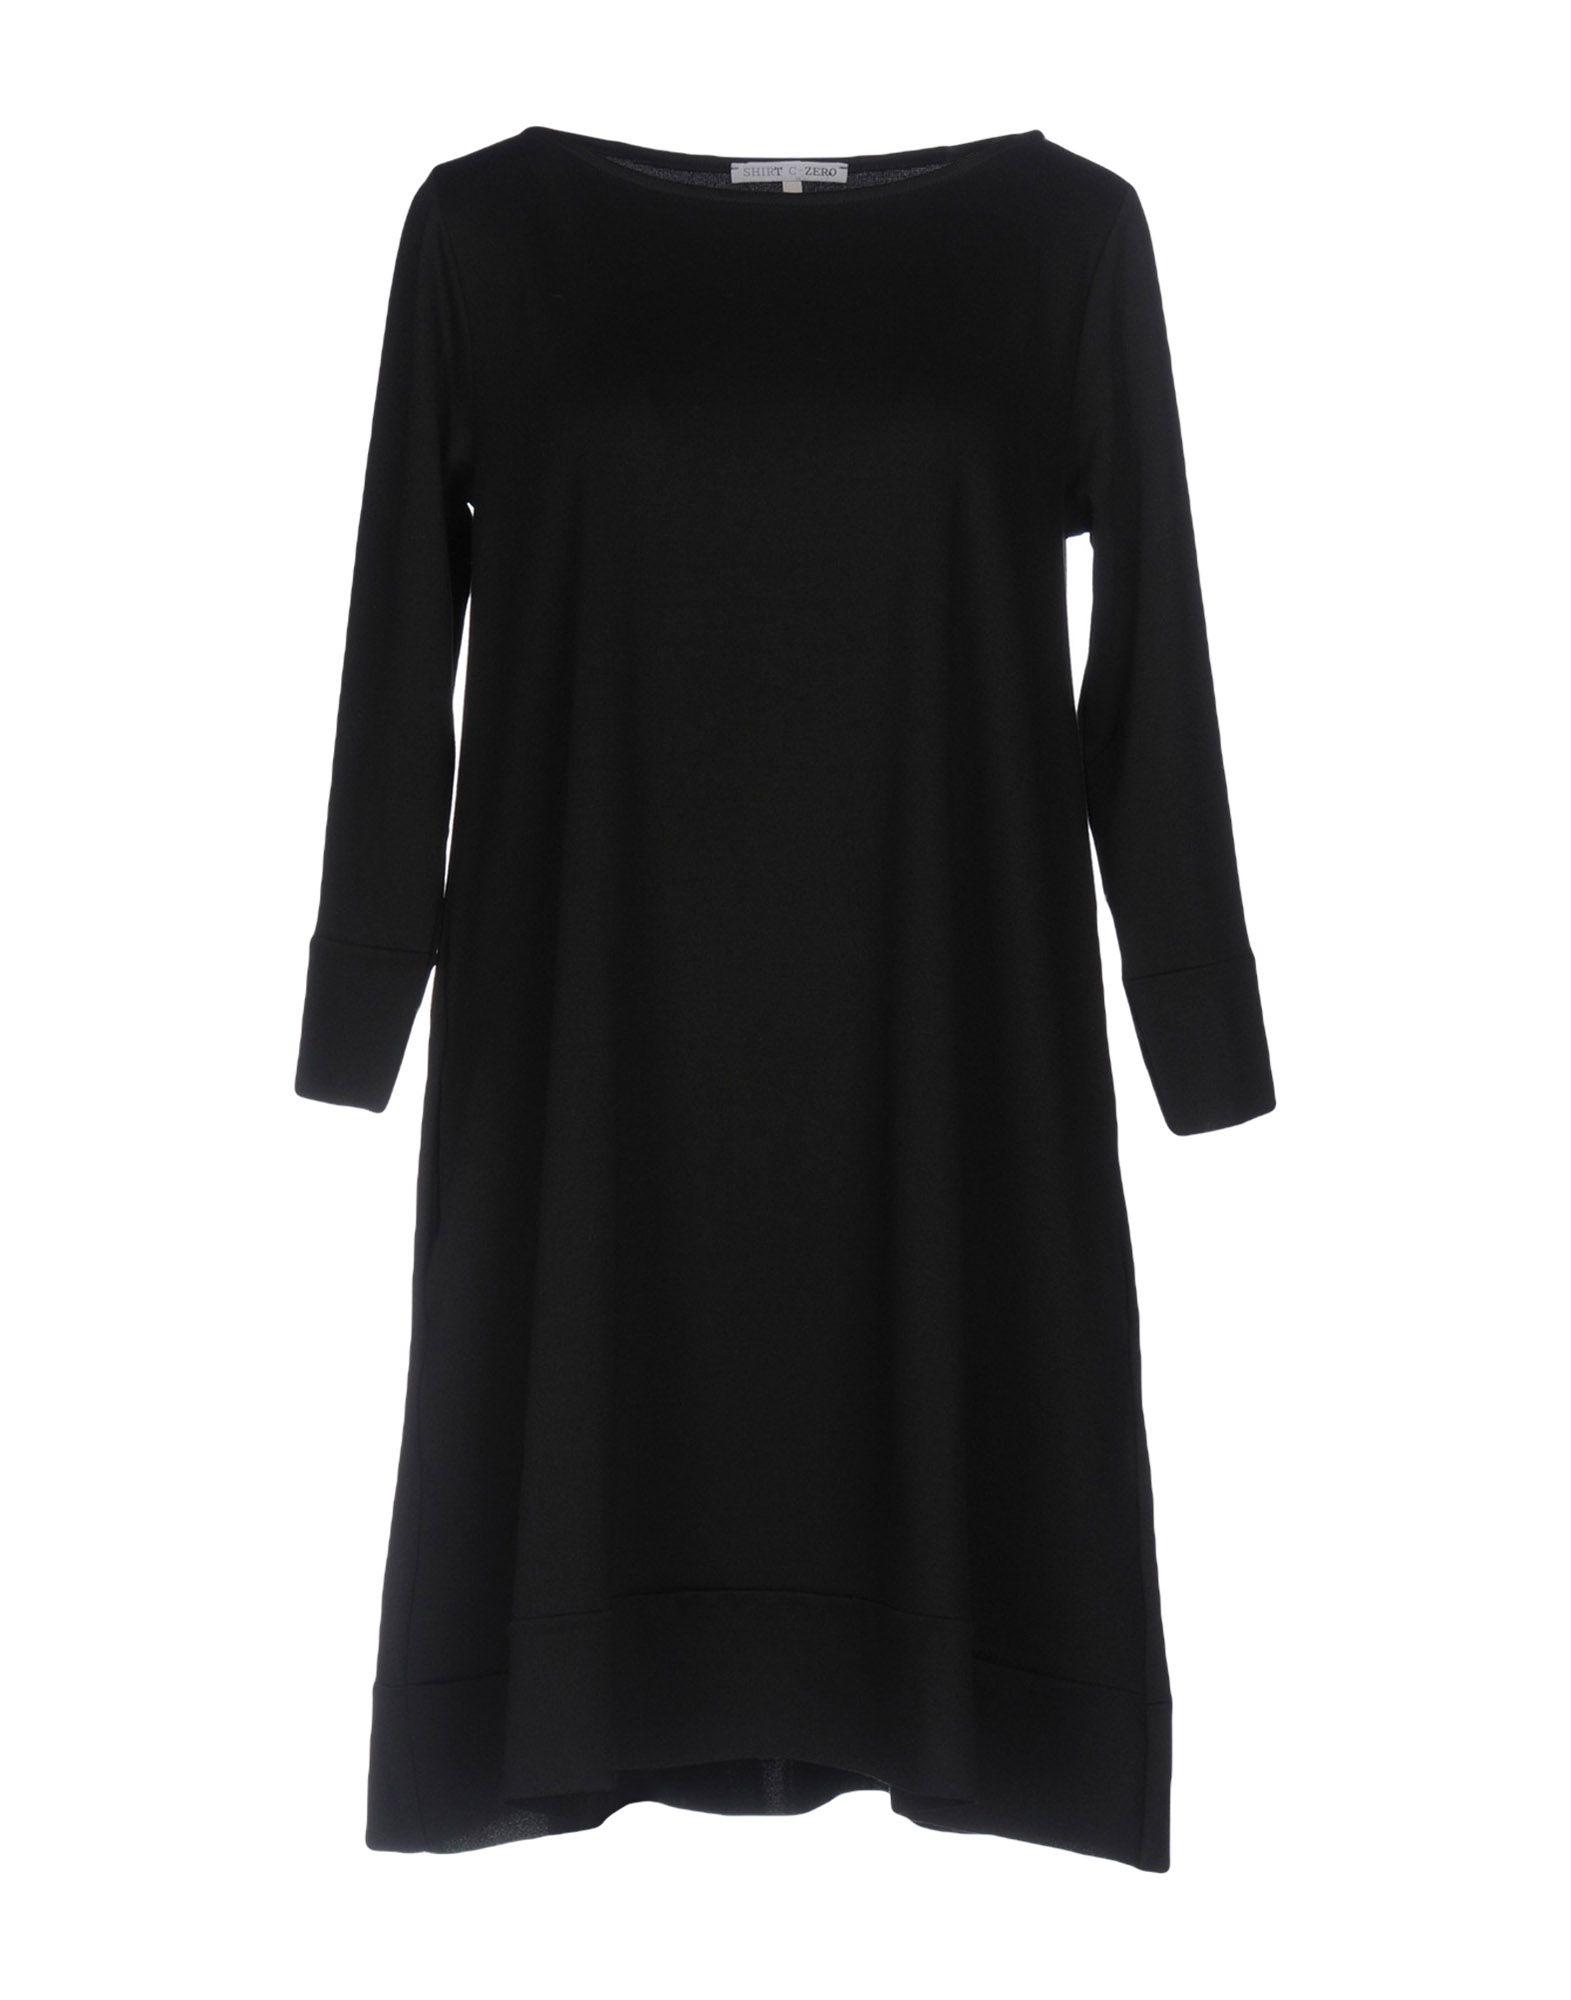 SHIRT C-ZERO Короткое платье платье zero платье